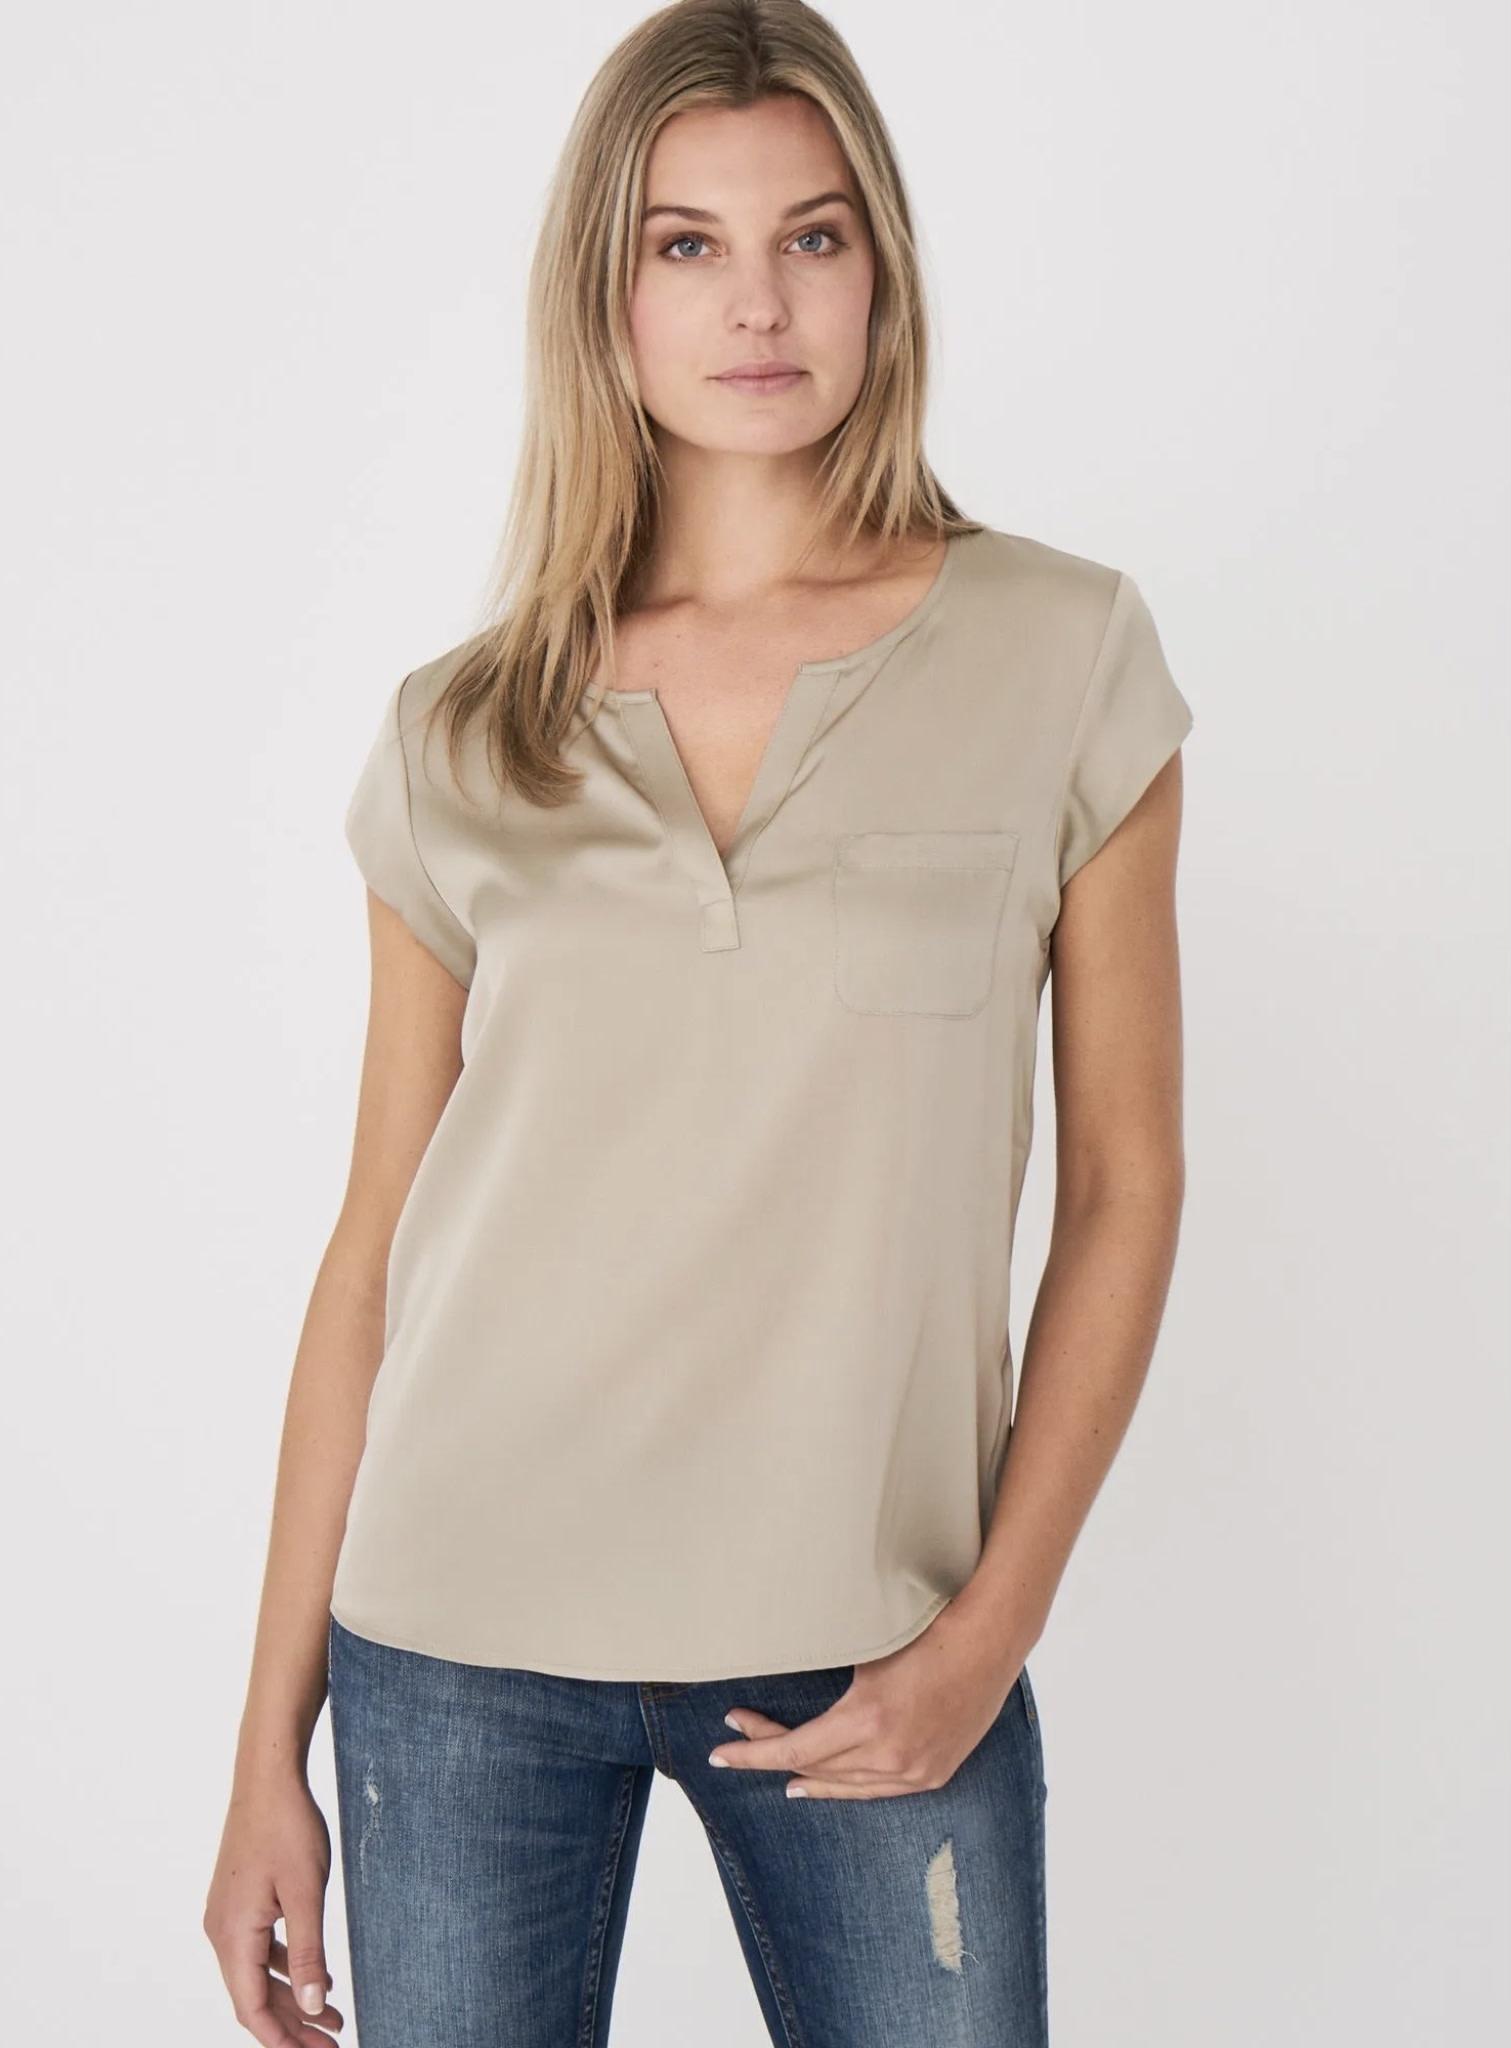 blouse repeat 600003-1